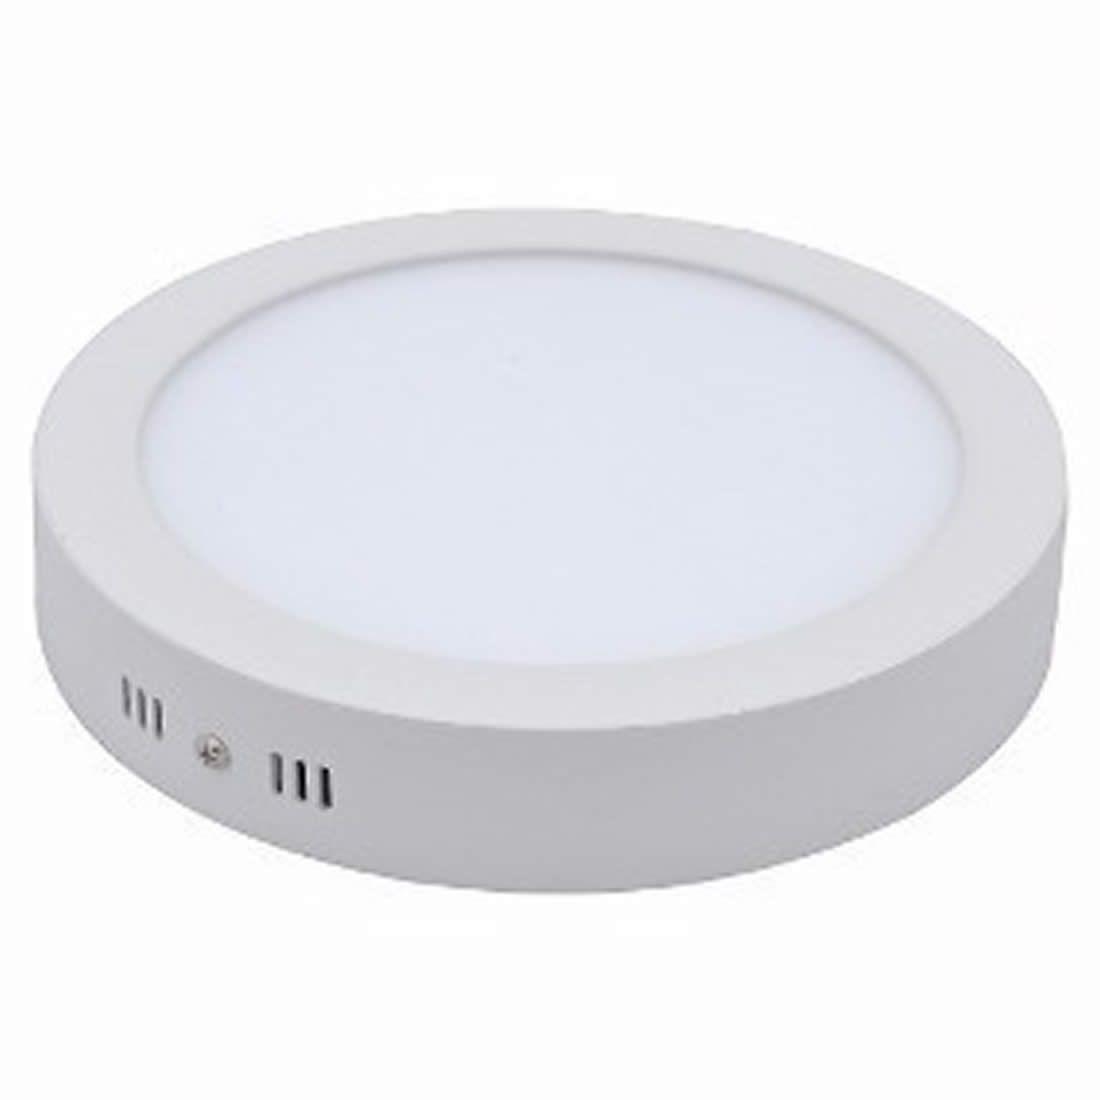 Luminária Ourolux Plafon Led Sobrepor Redondo Bivolt 36W Luz Branca 6400K